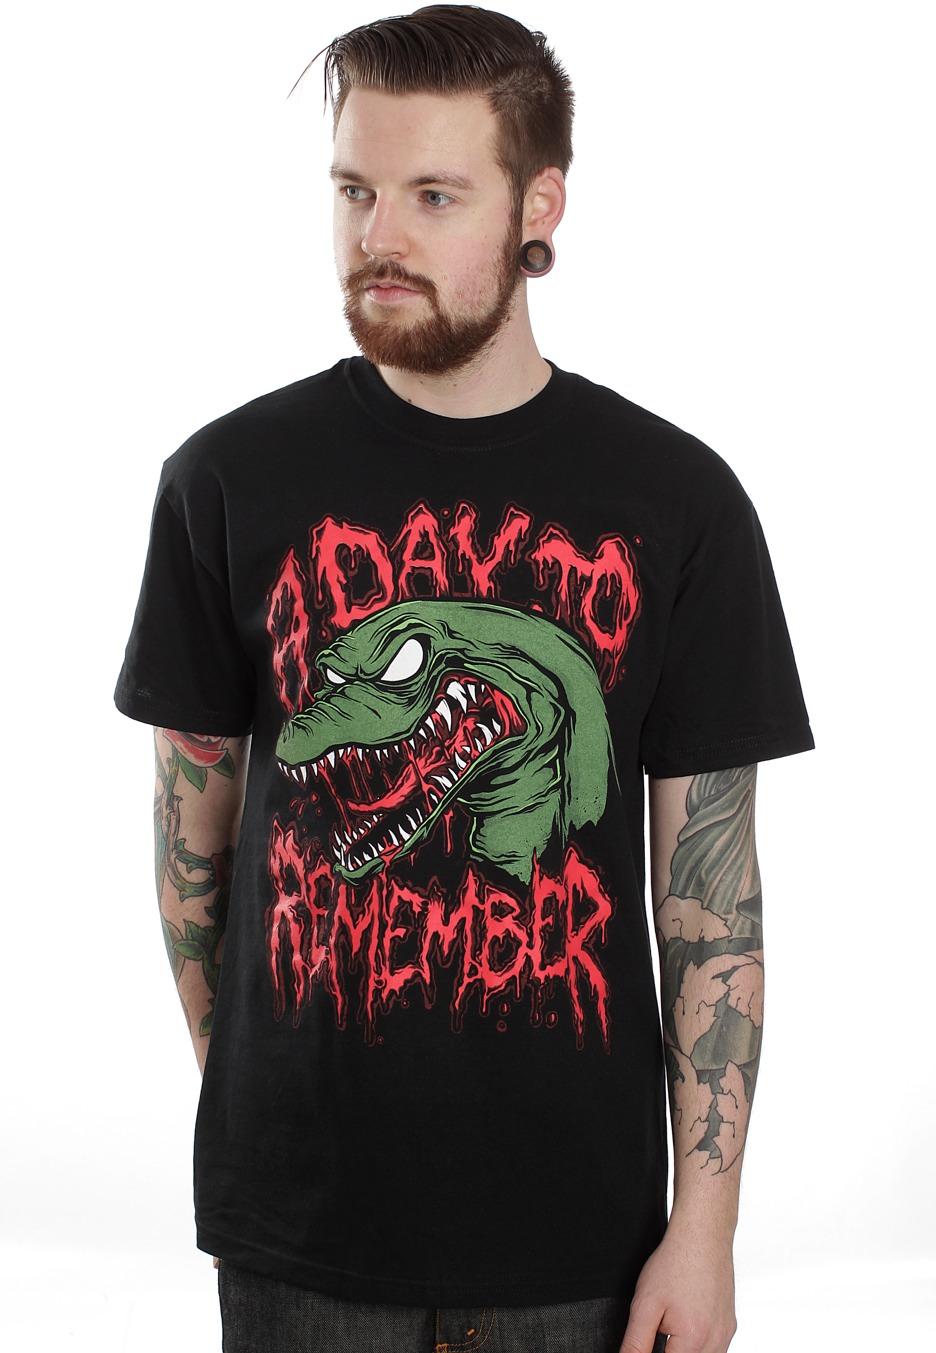 a day to remember gator vicious t shirt official pop punk merchandise shop uk. Black Bedroom Furniture Sets. Home Design Ideas